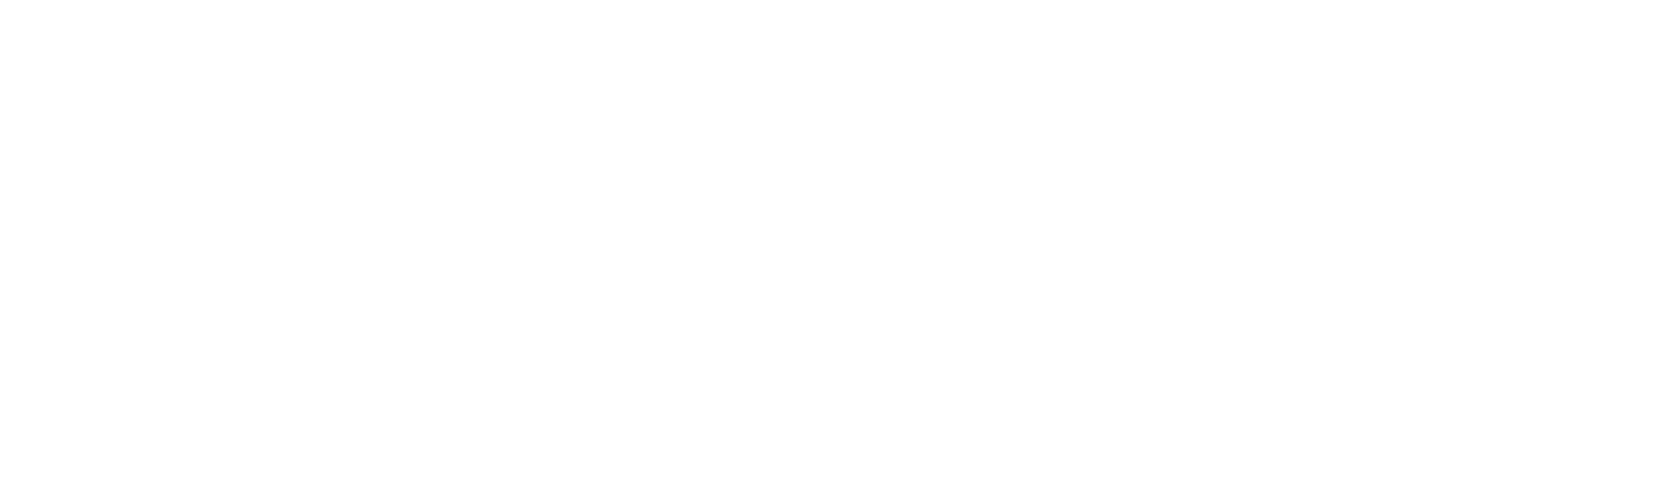 Hanfverband Ortsgruppe Karlsruhe